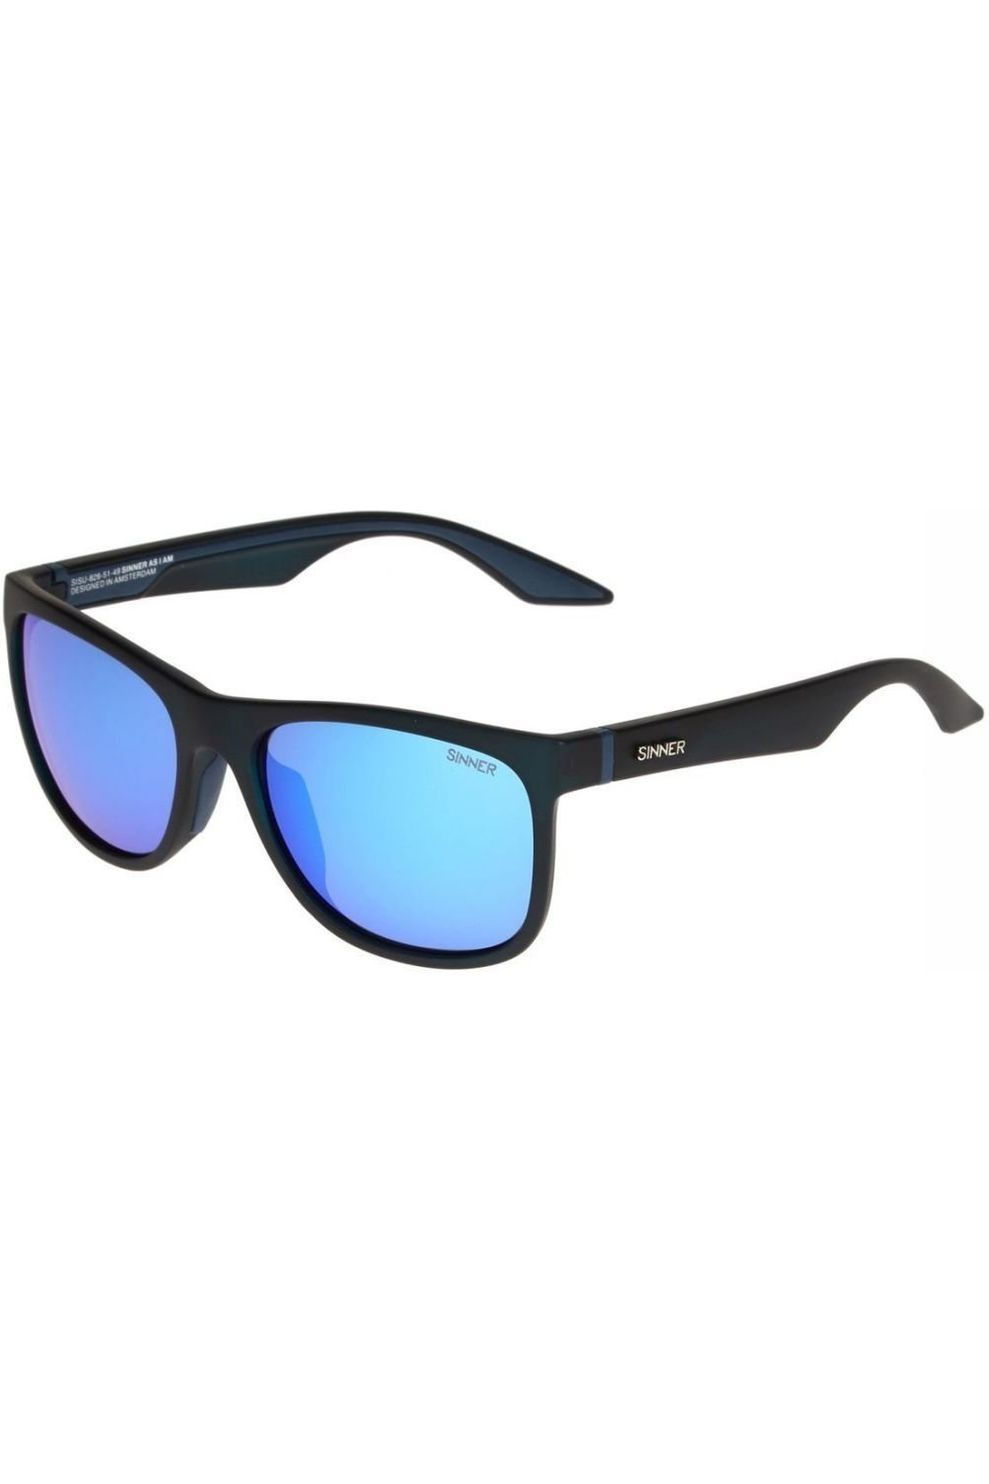 SINNER Bril Rockford - Zwart/Blauw